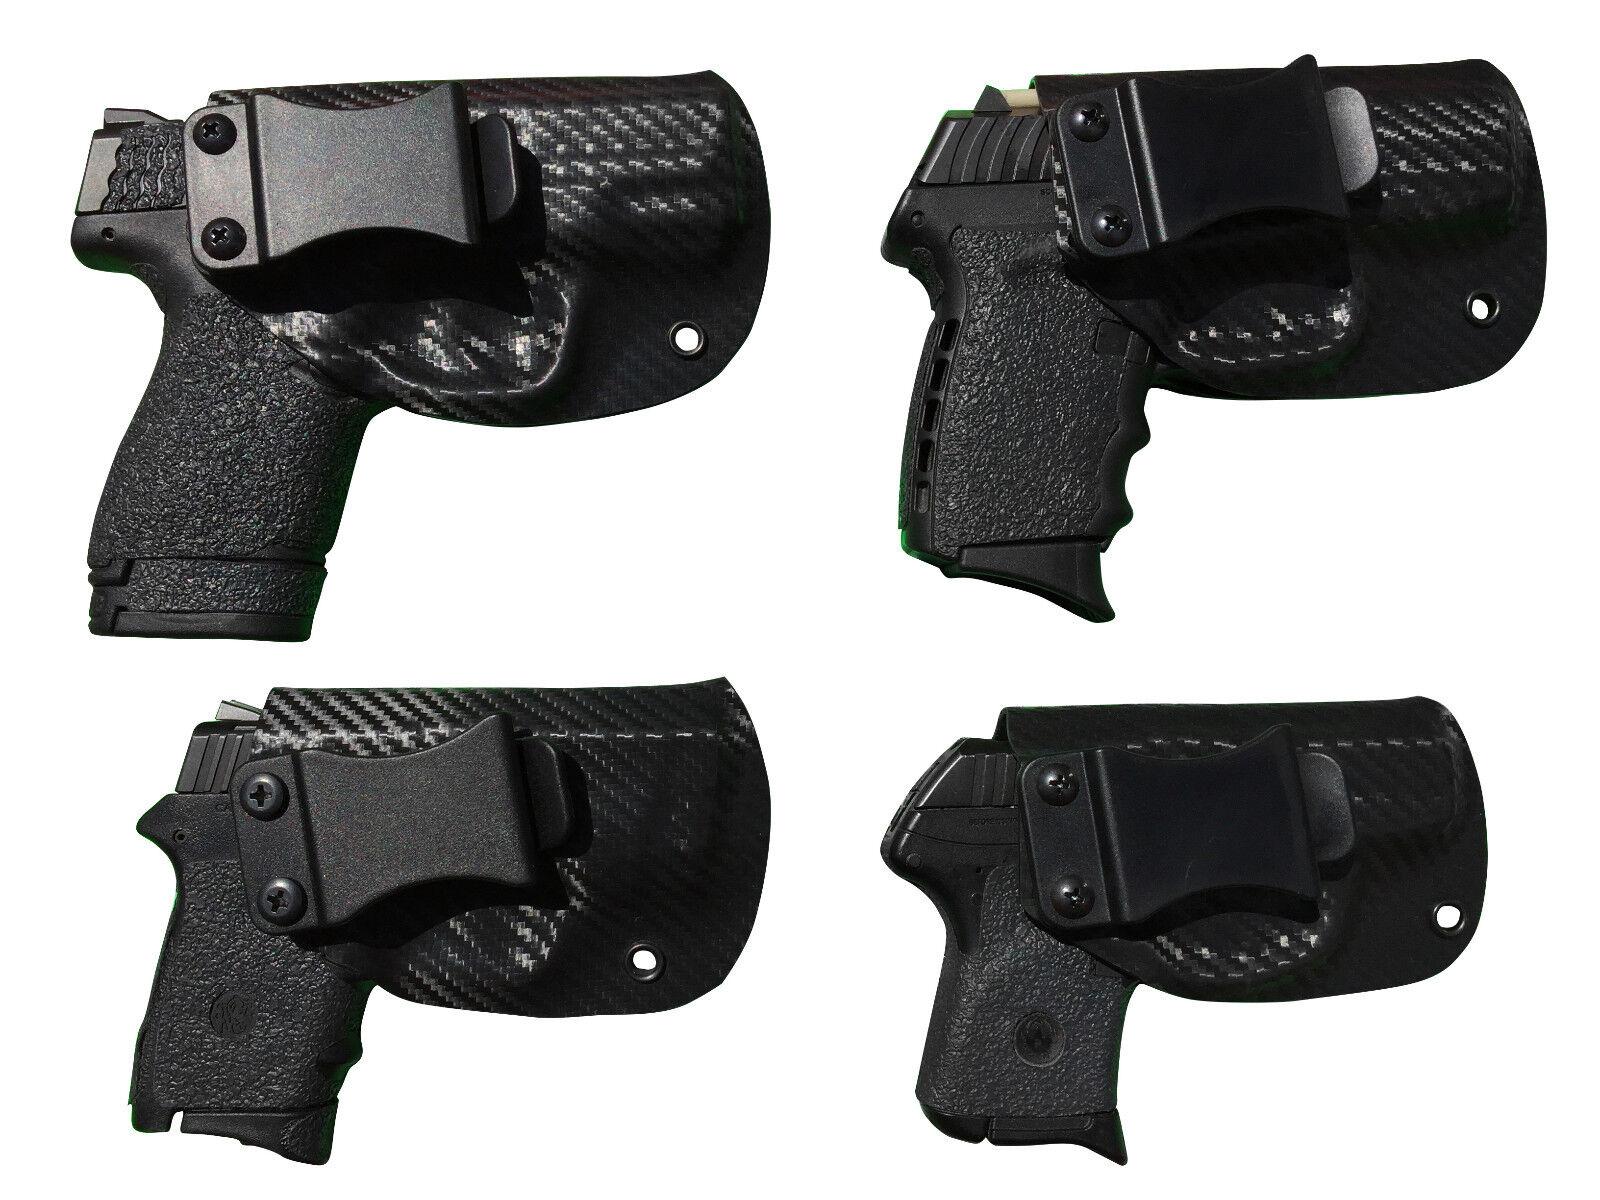 Beretta PX4 Storm Compact /Full Custom Kydex IWB Holster